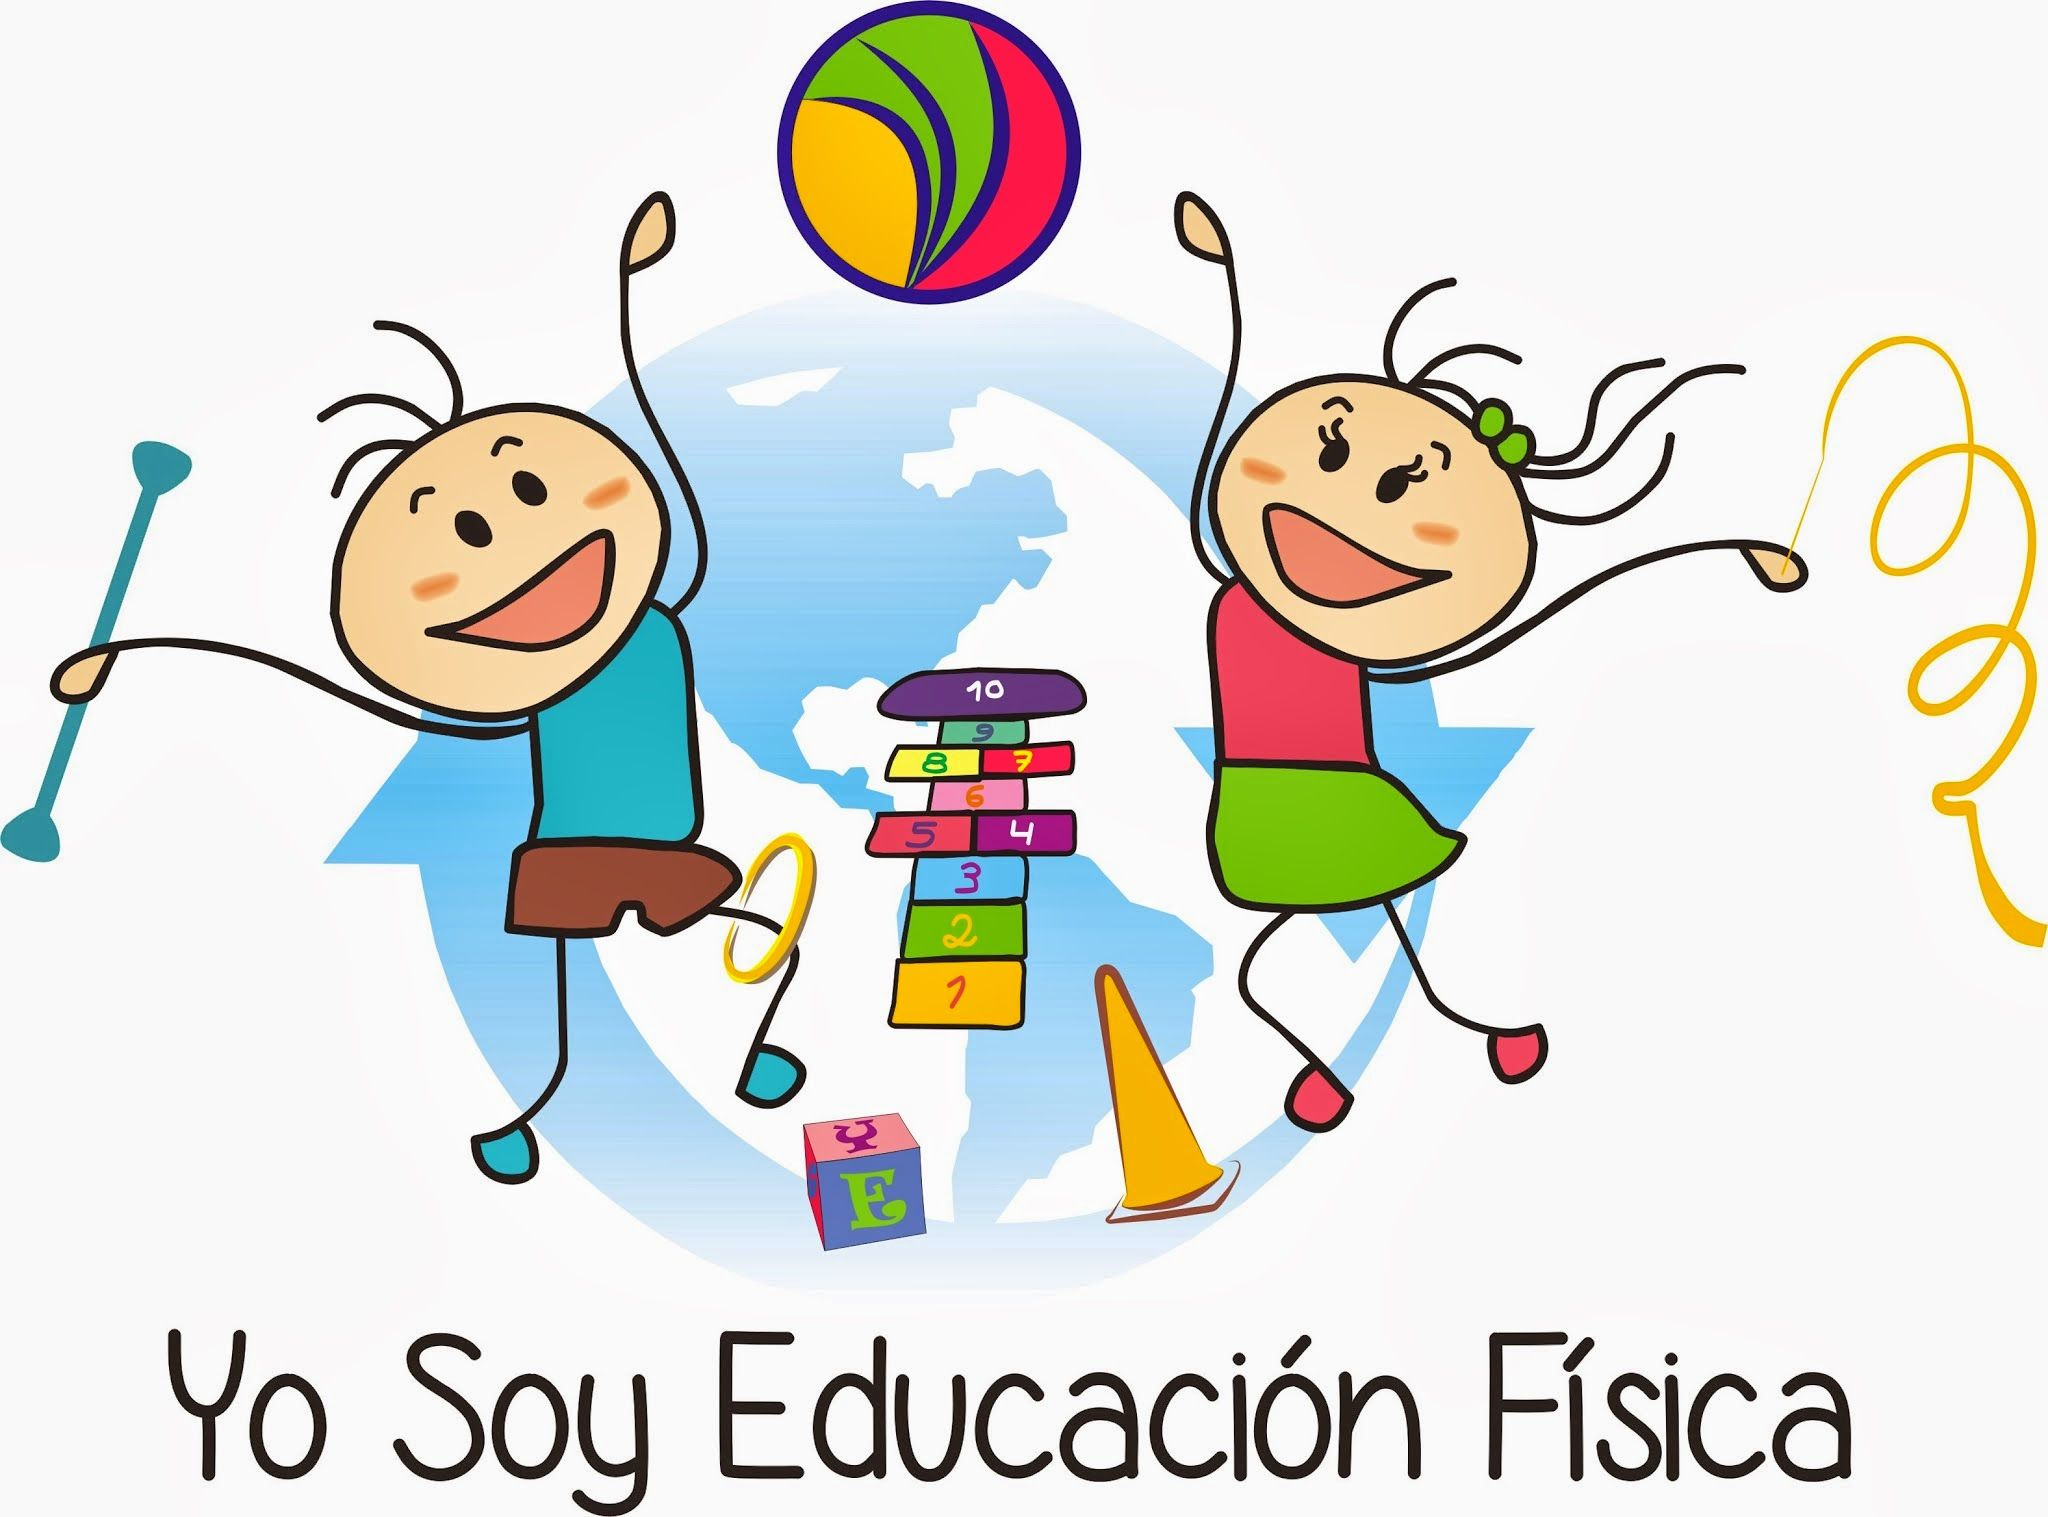 Yo Soy Educacion Fisica - Videos - Google+ | Profesor educacion ...